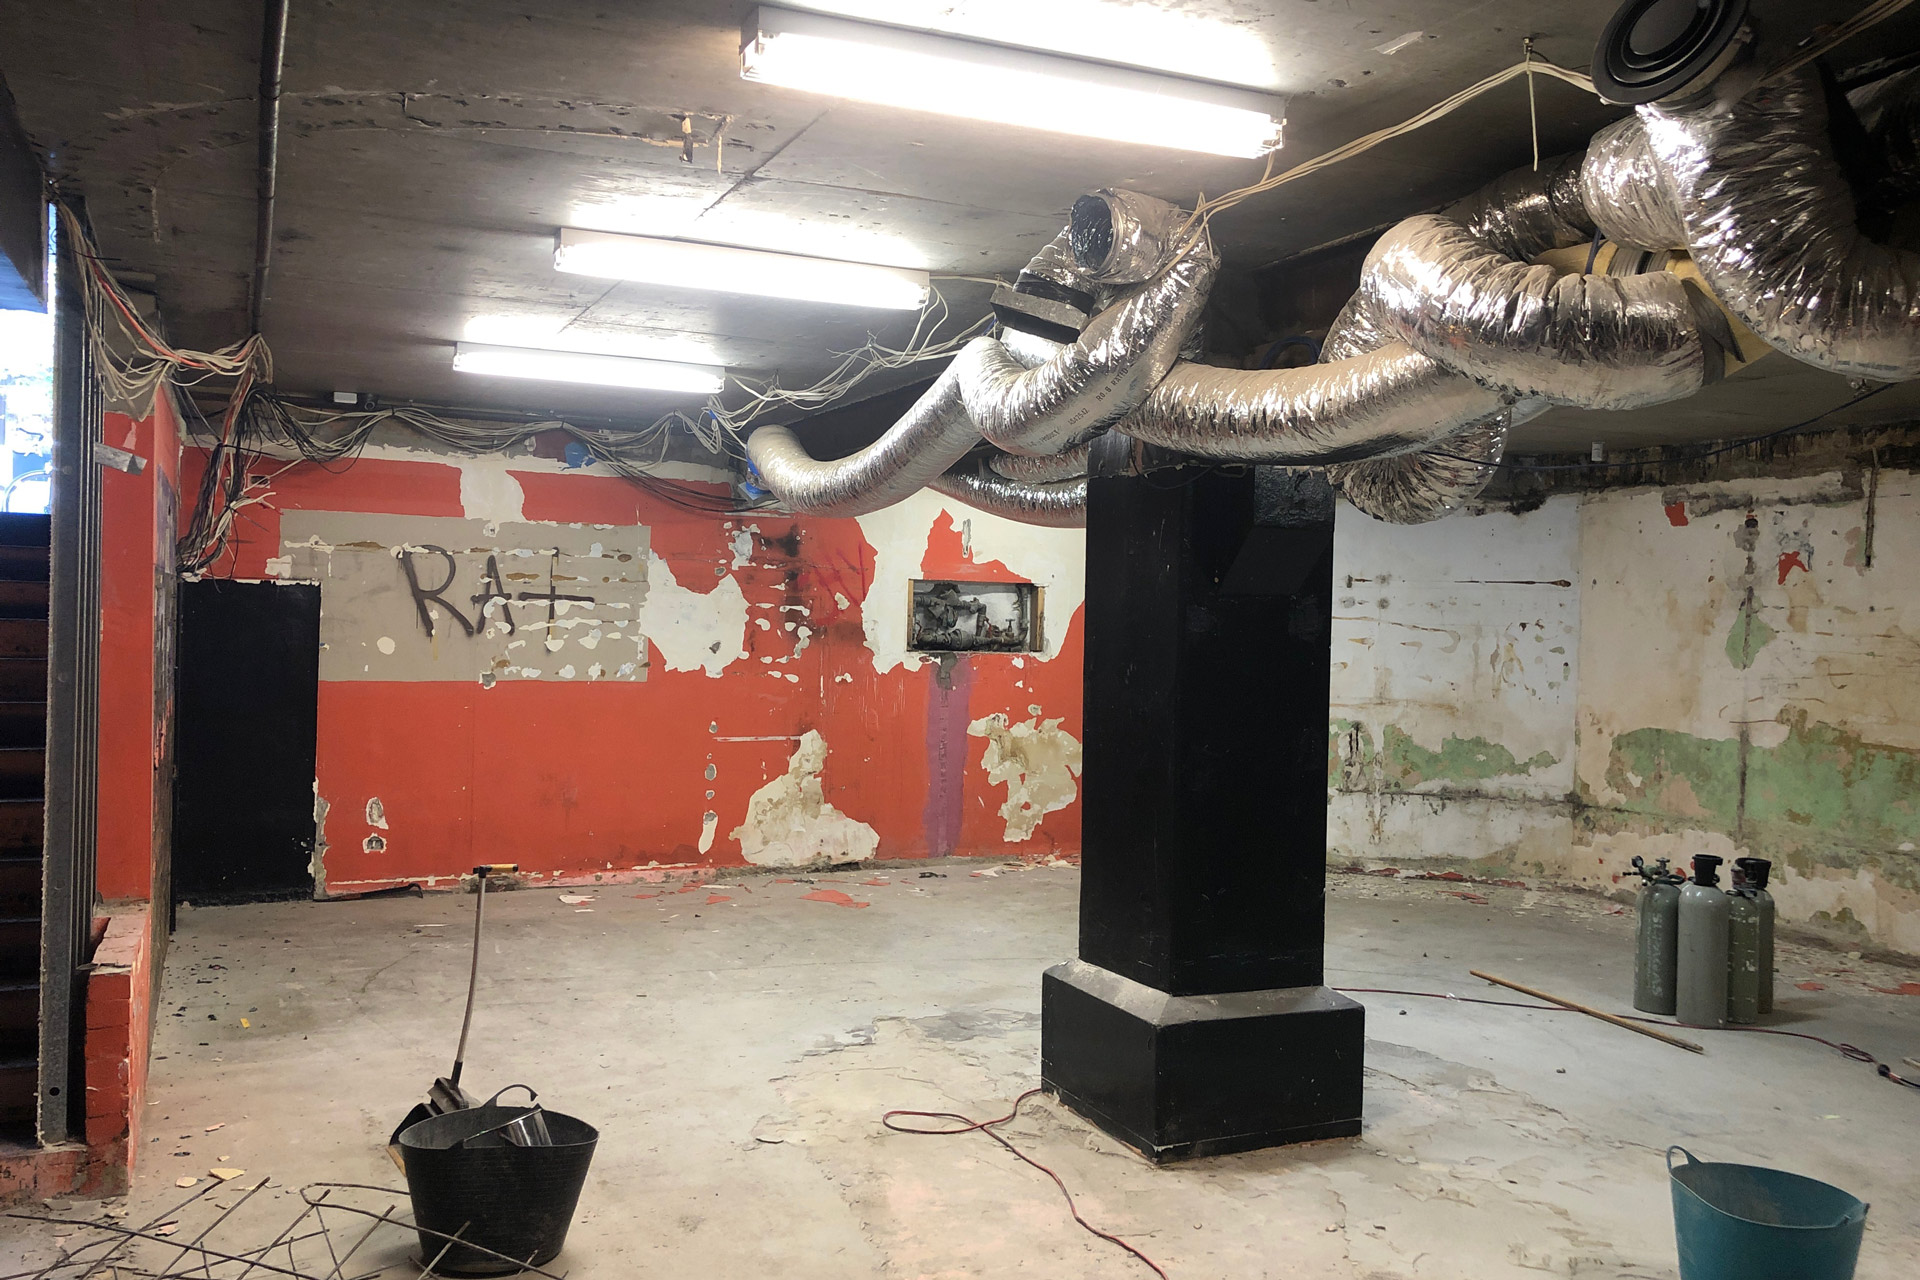 Nightclub Demolition Sydney CBD